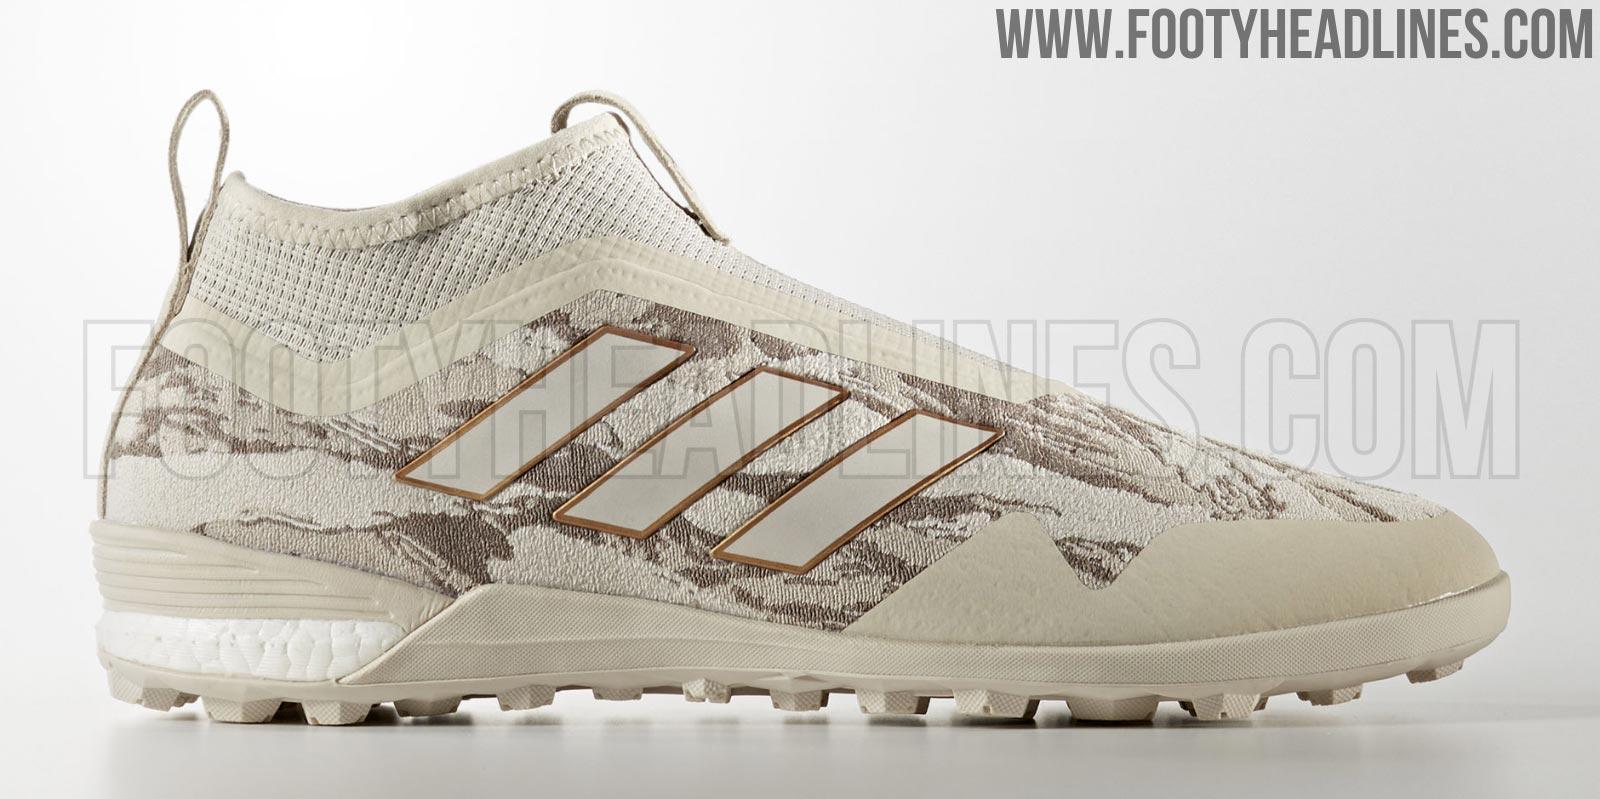 Pogboom Chaussures Ace 17Purecontrol ExclusifFuite Adidas Des 5L4RAj